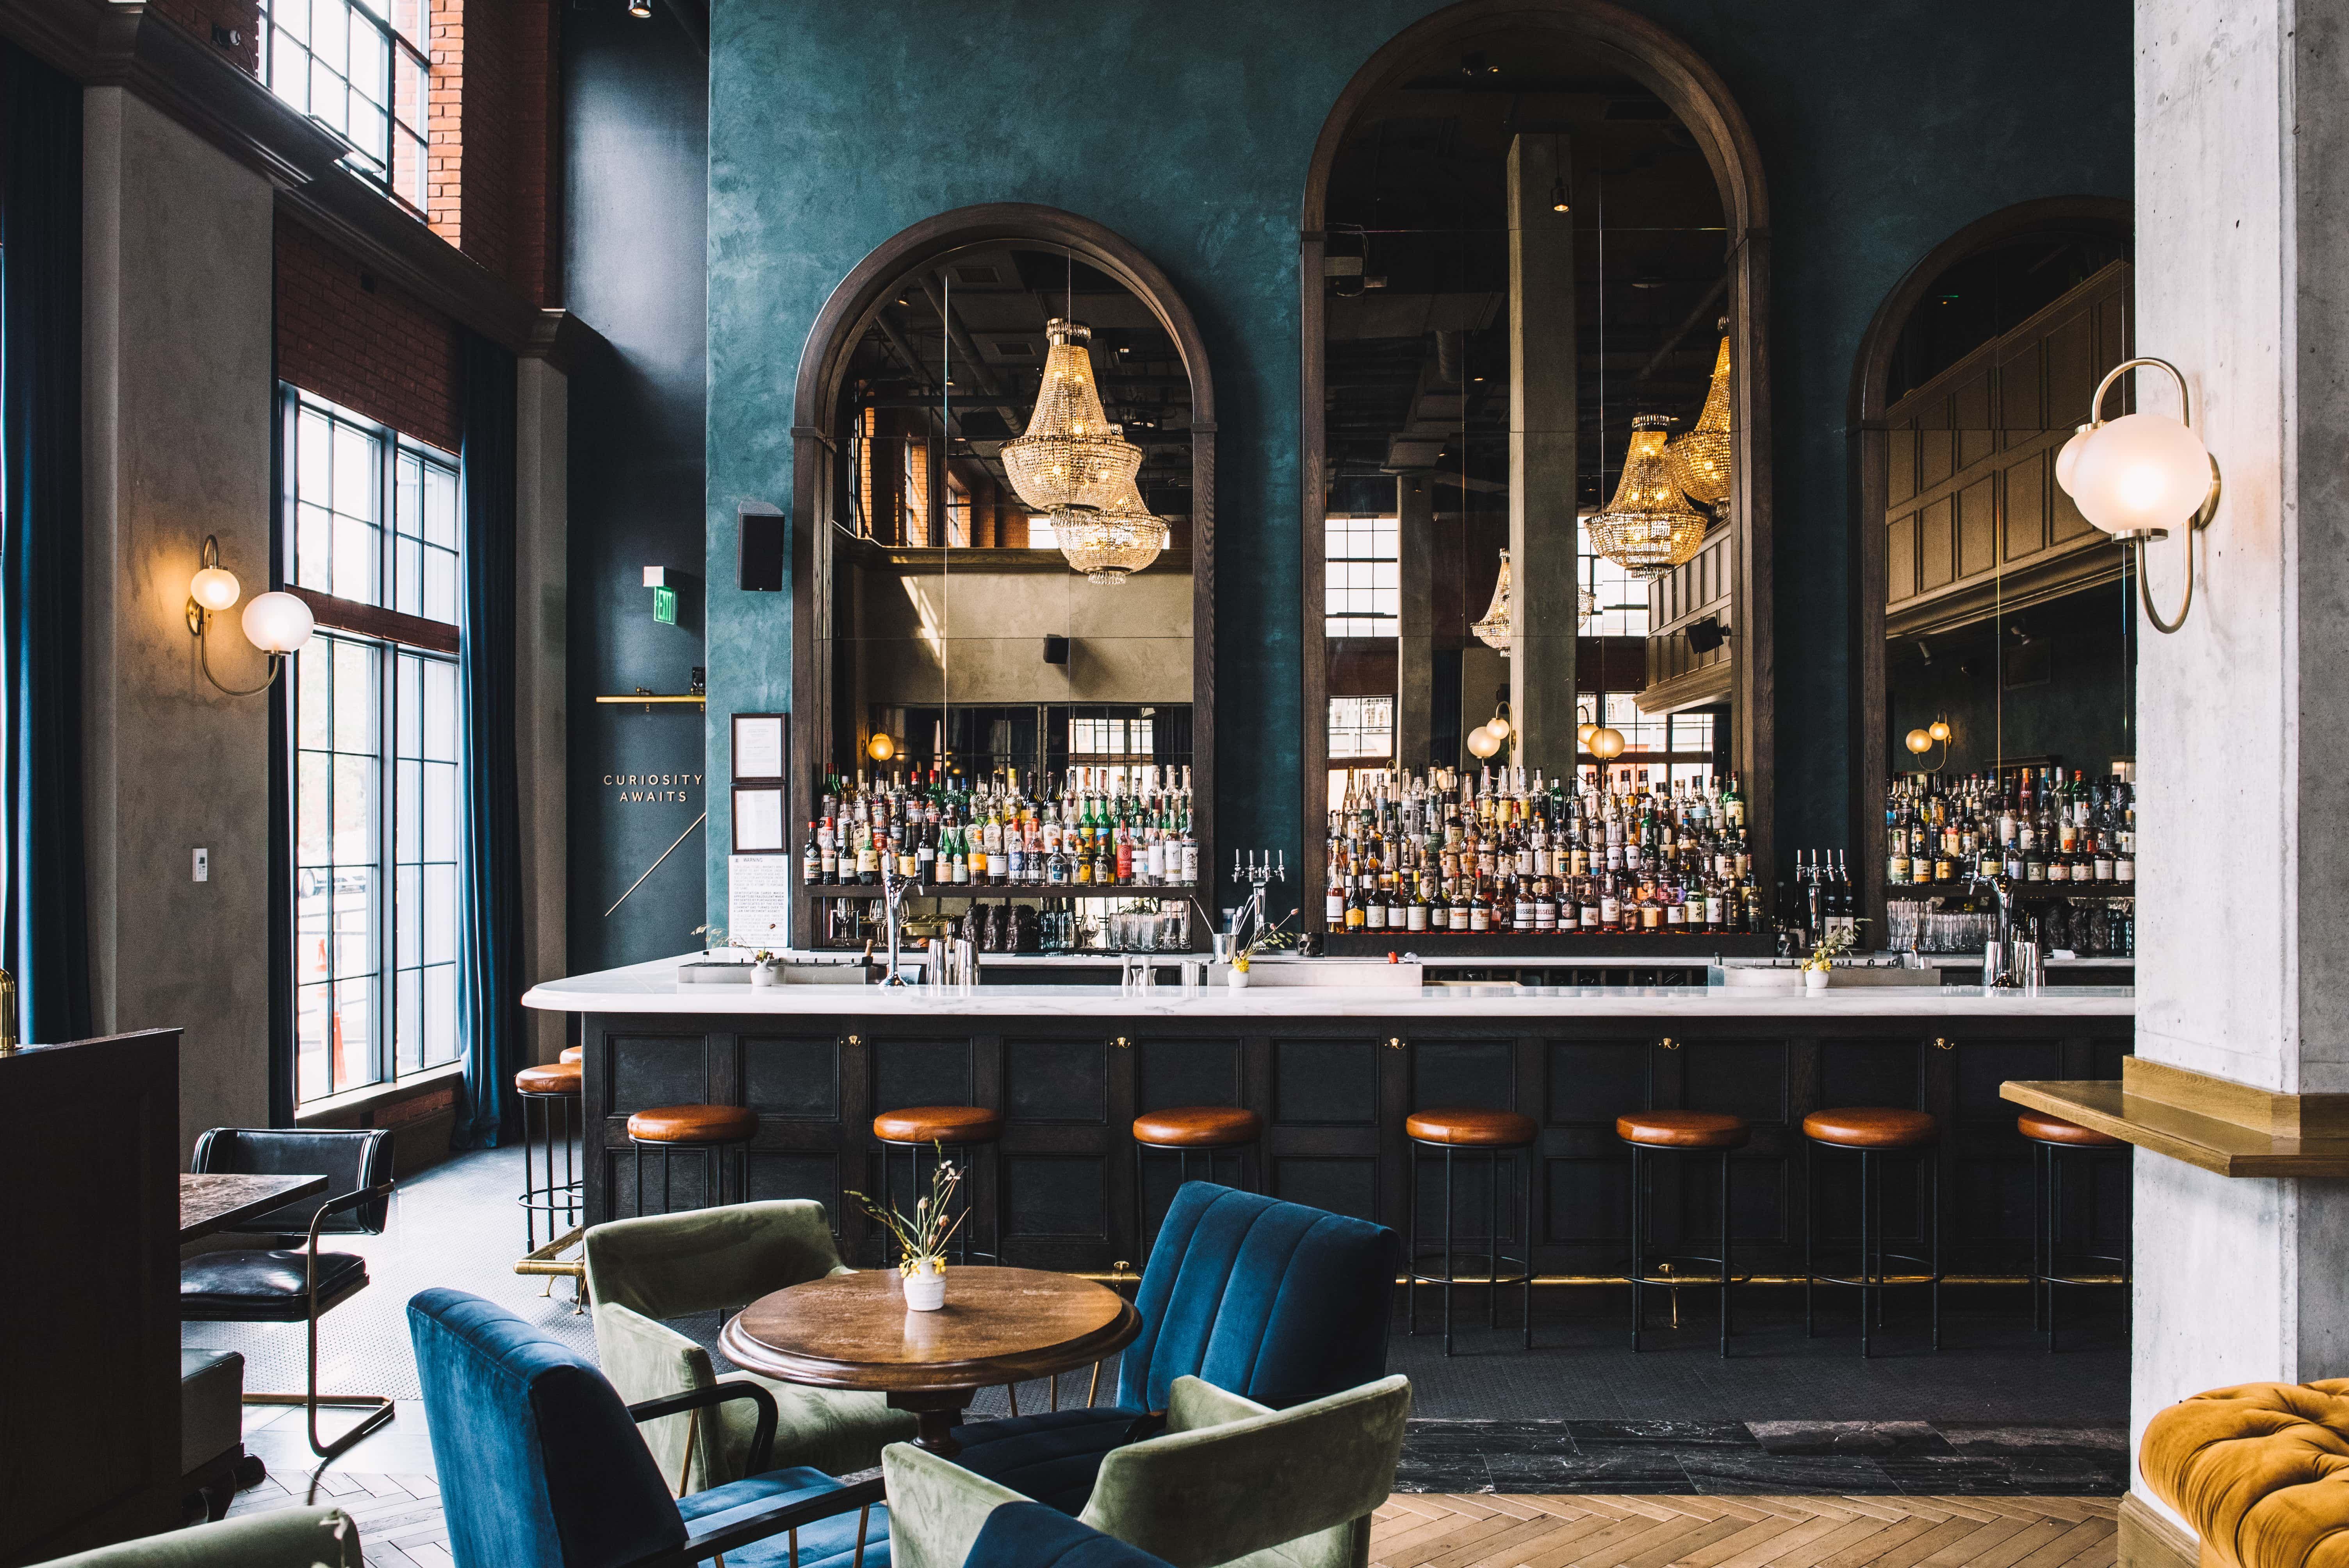 The Ramble Hotel Boutique Hotel In Rino Downtown Denver Bar Design Restaurant Luxury Bar Bar Interior Design